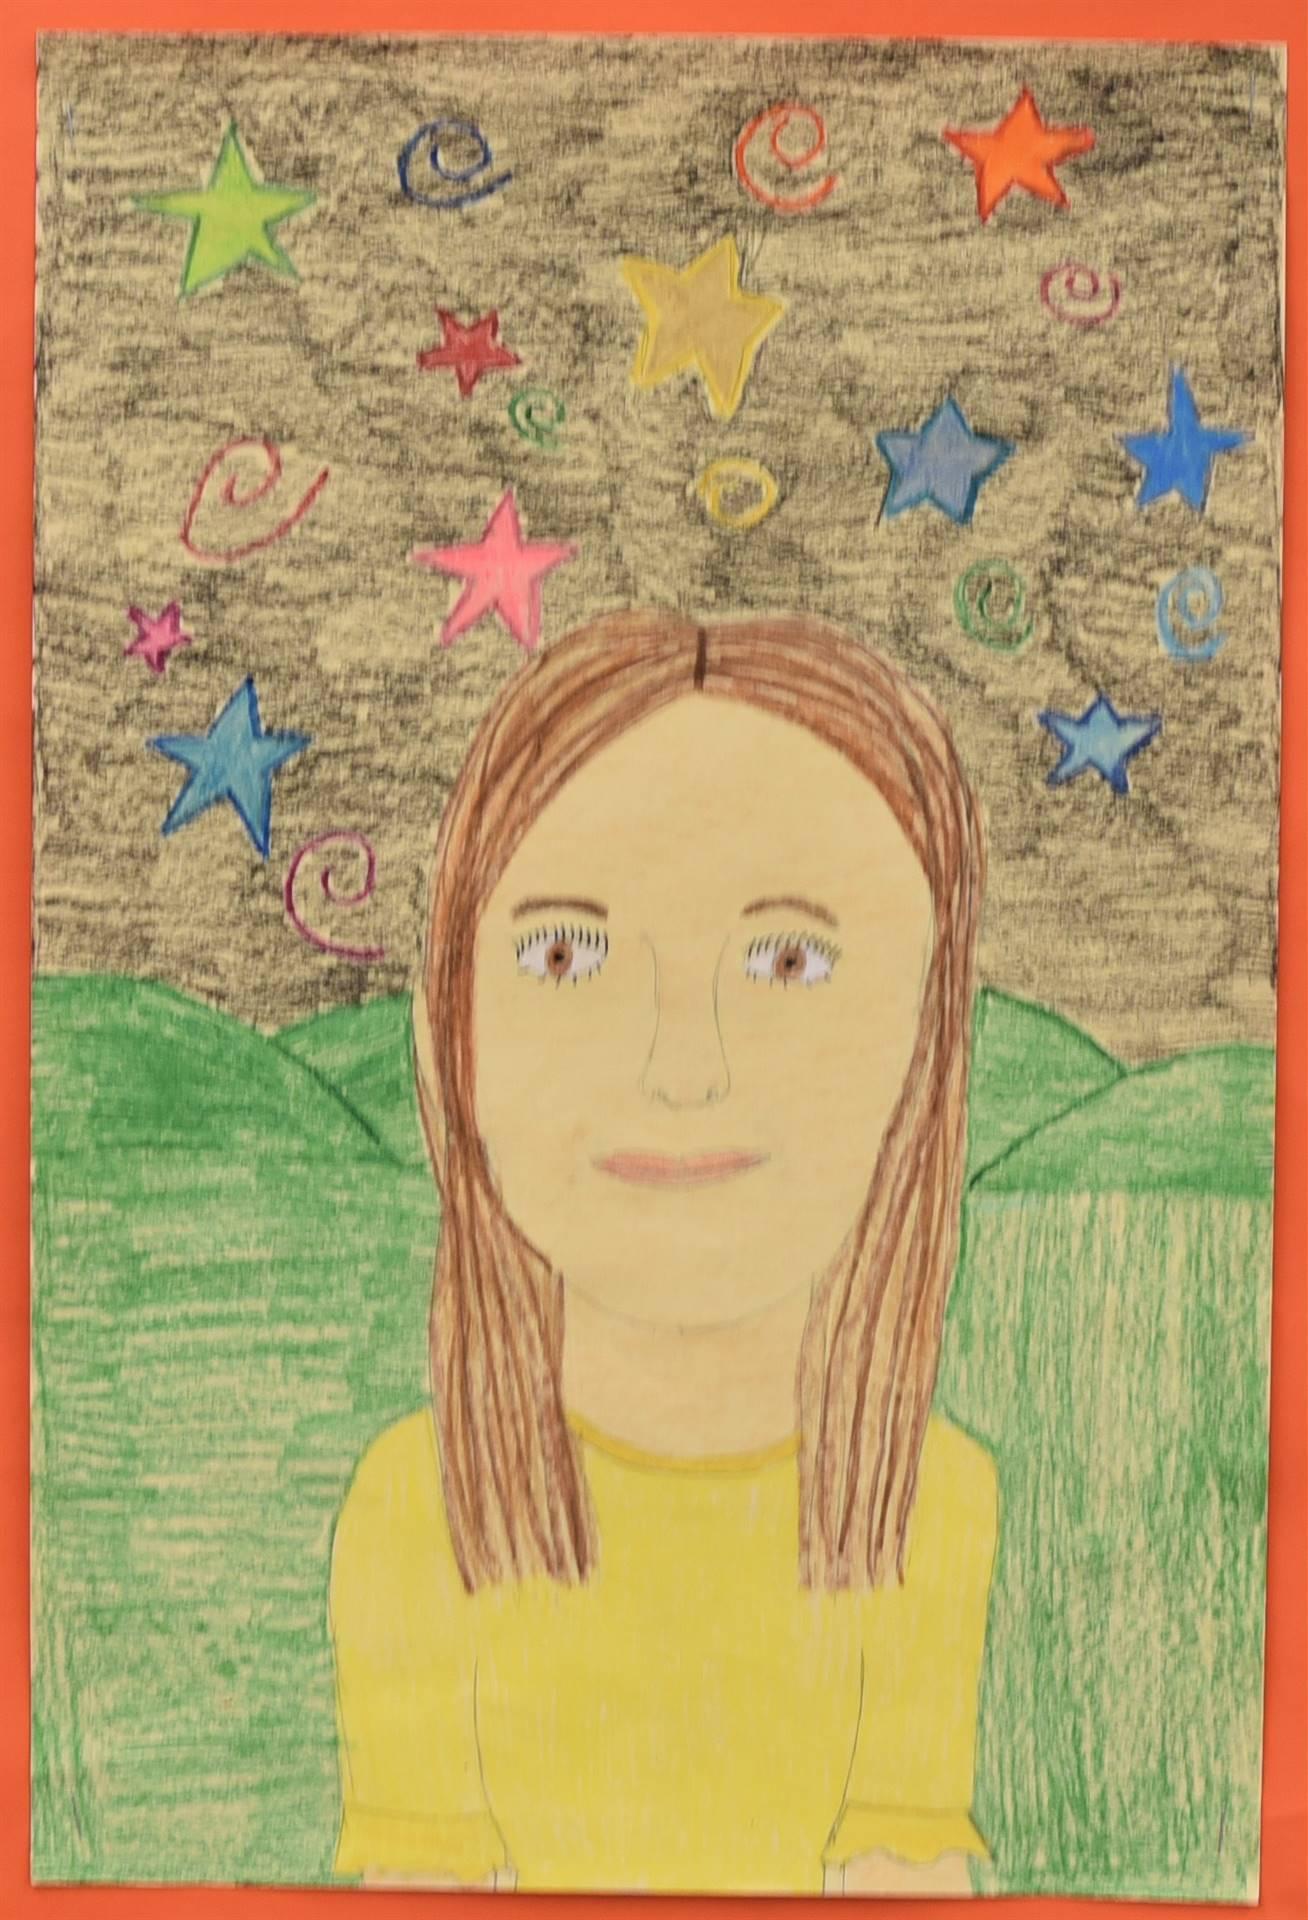 Brecksville-Broadview Hts. Middle School Art Projects 173